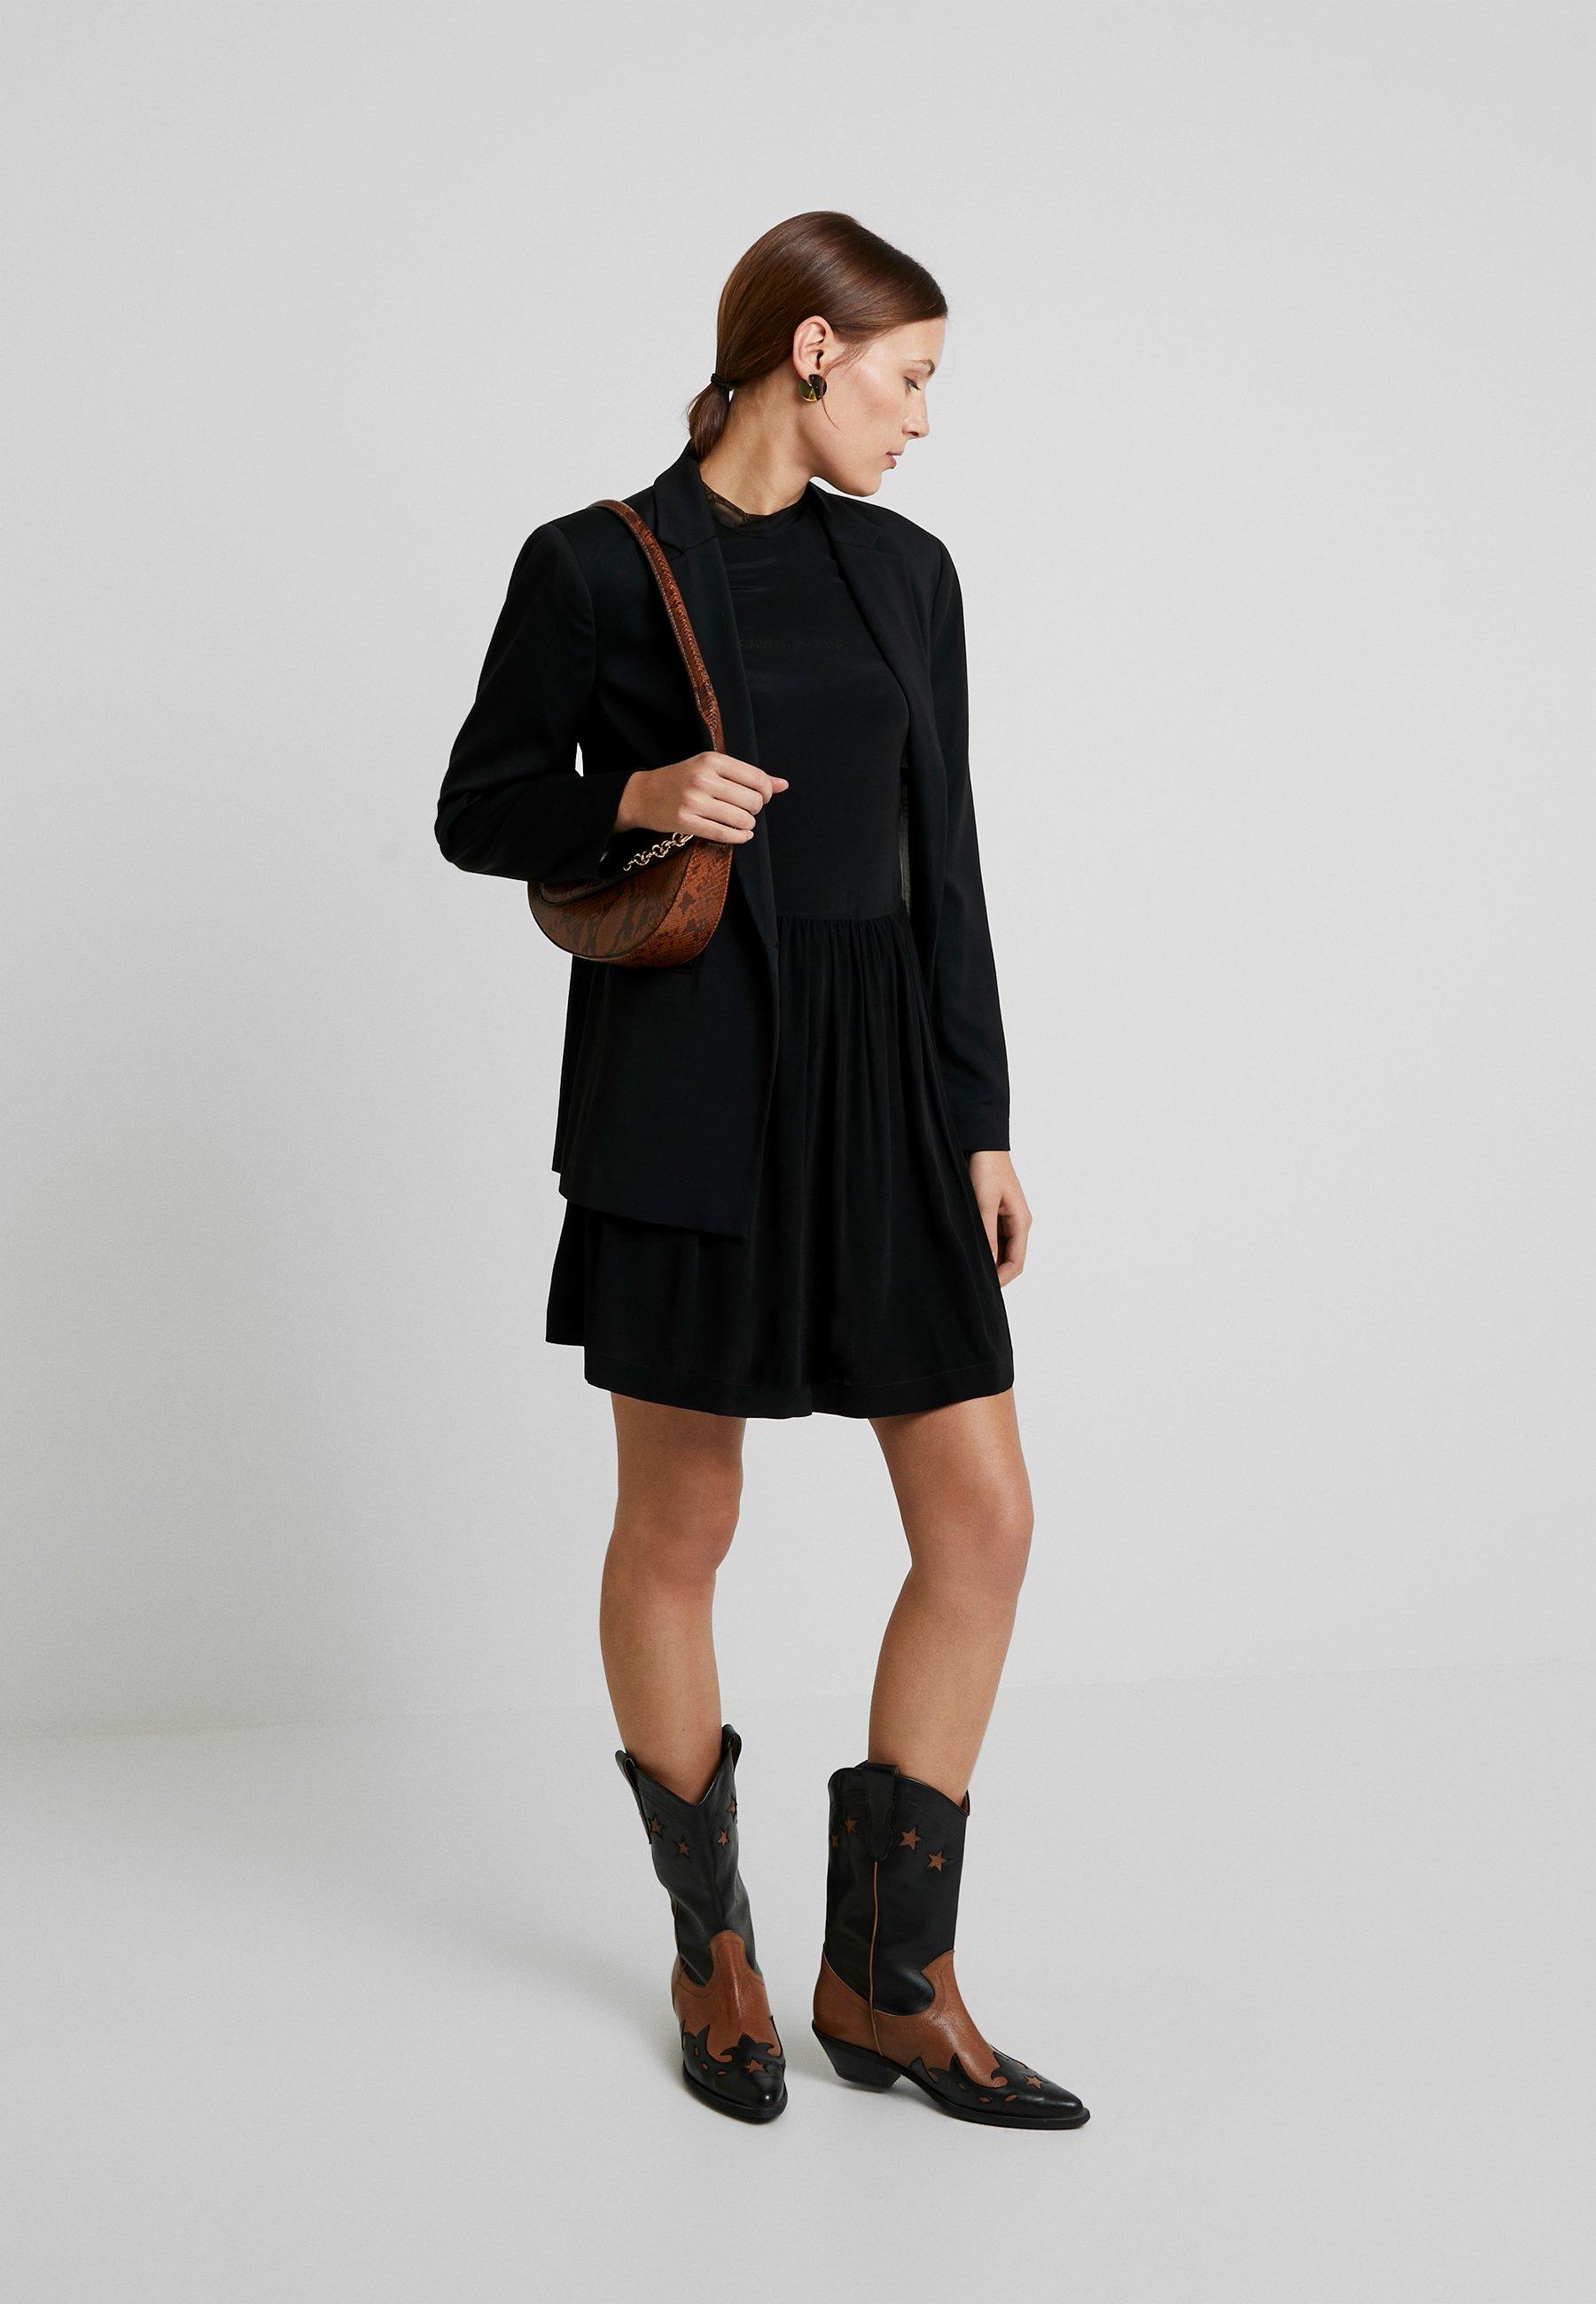 Calvin Klein Jeans Skater Dress - Vardagsklänning Black